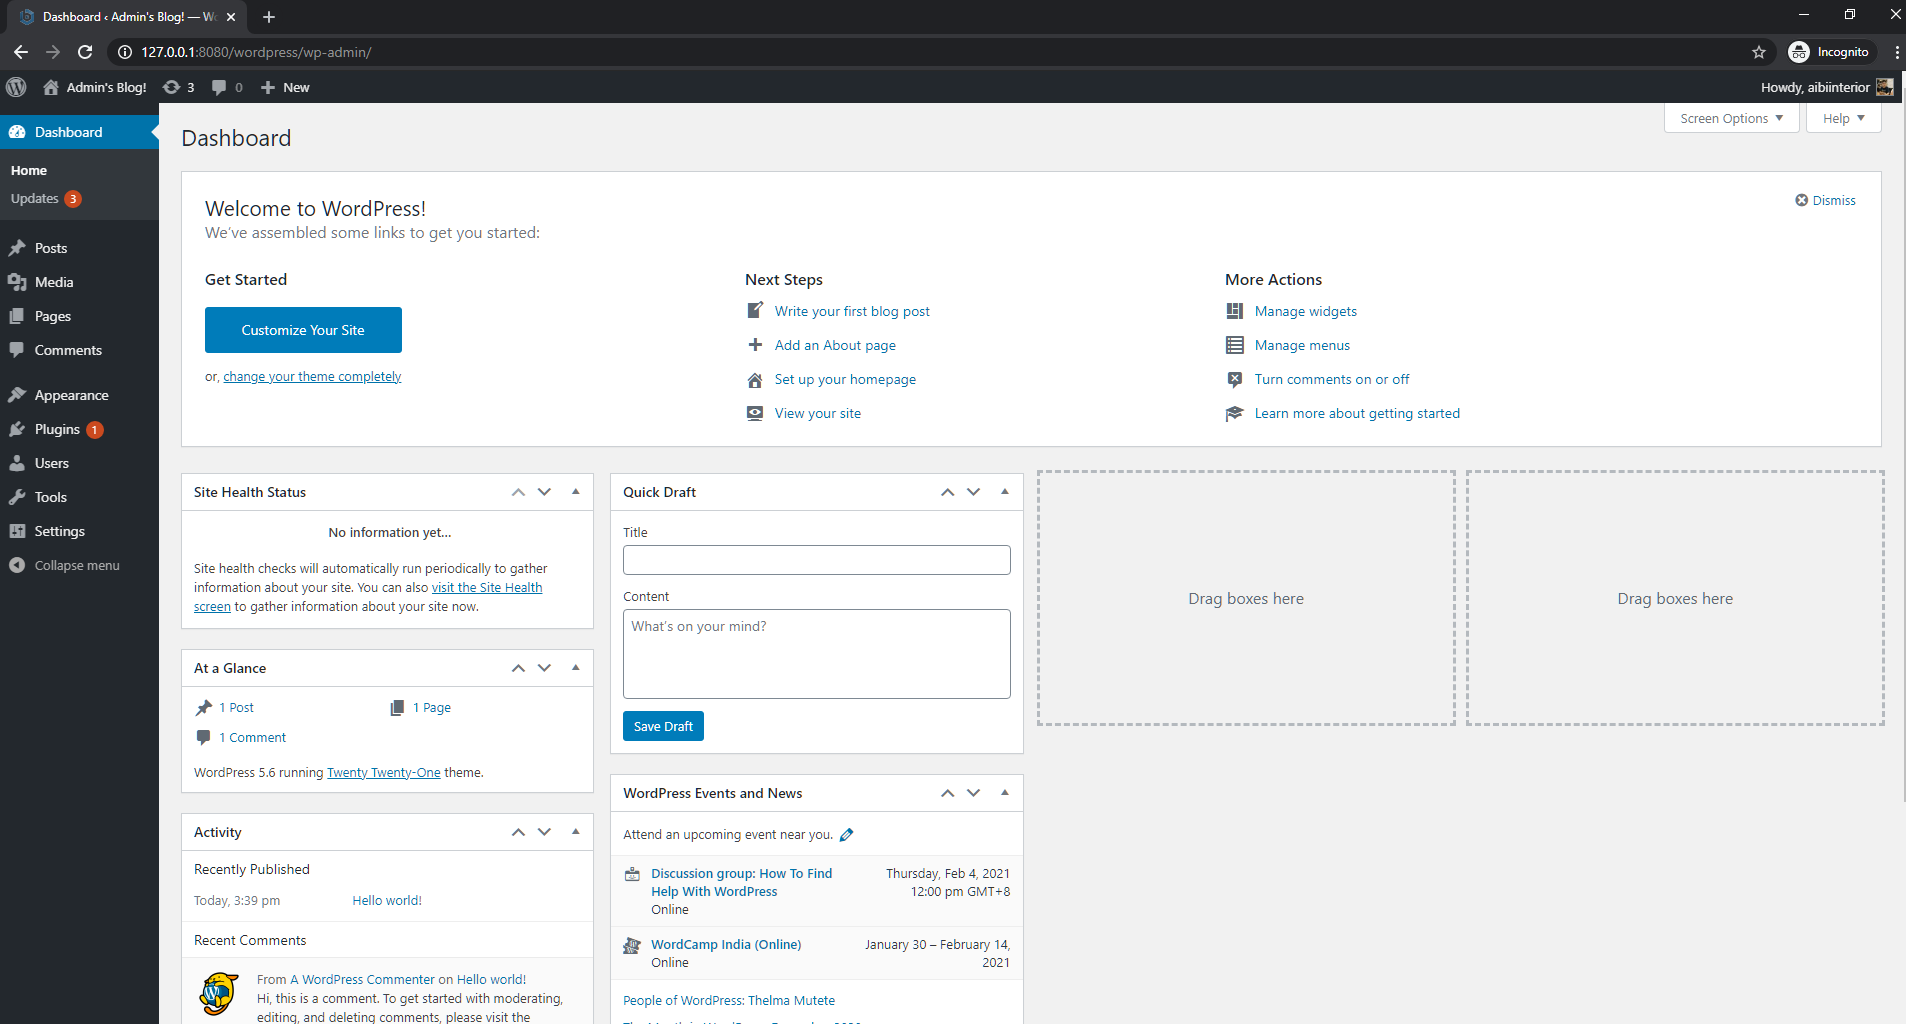 WordPress console